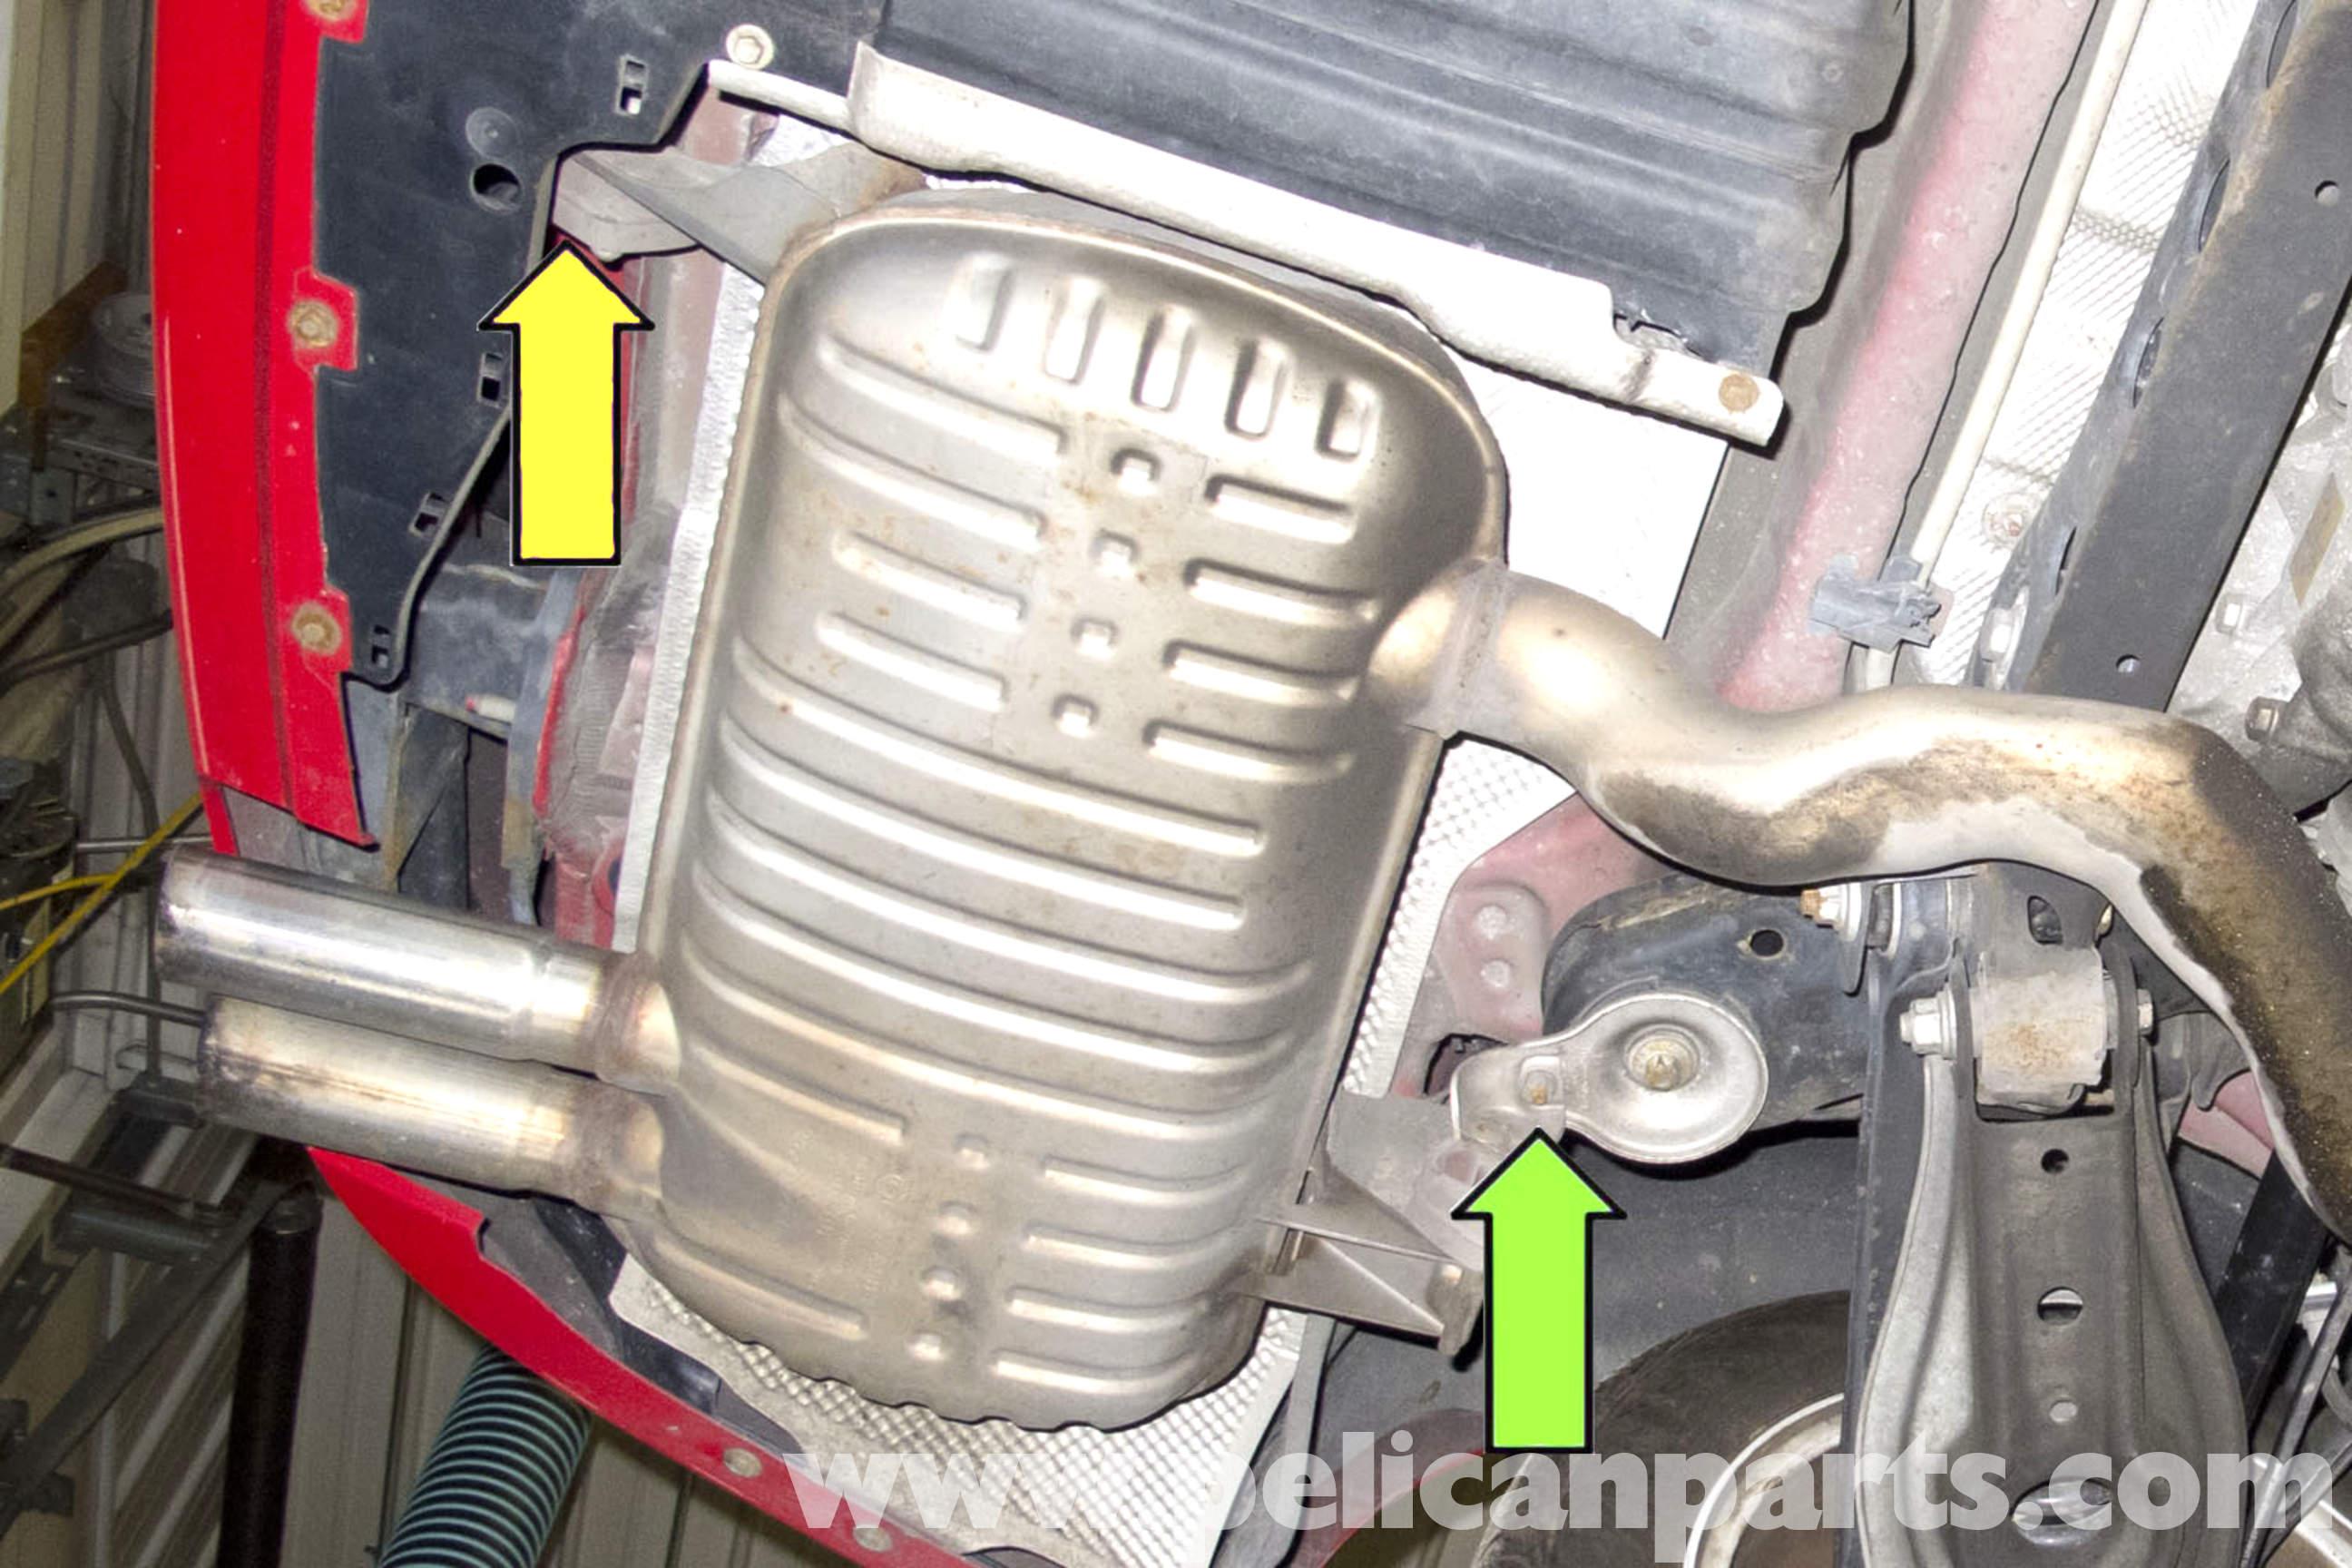 E90 335i Engine Diagram Books Of Wiring 2011 Bmw X3 Rear Muffler Replacement E91 E92 E93 Pelican Schematic N54